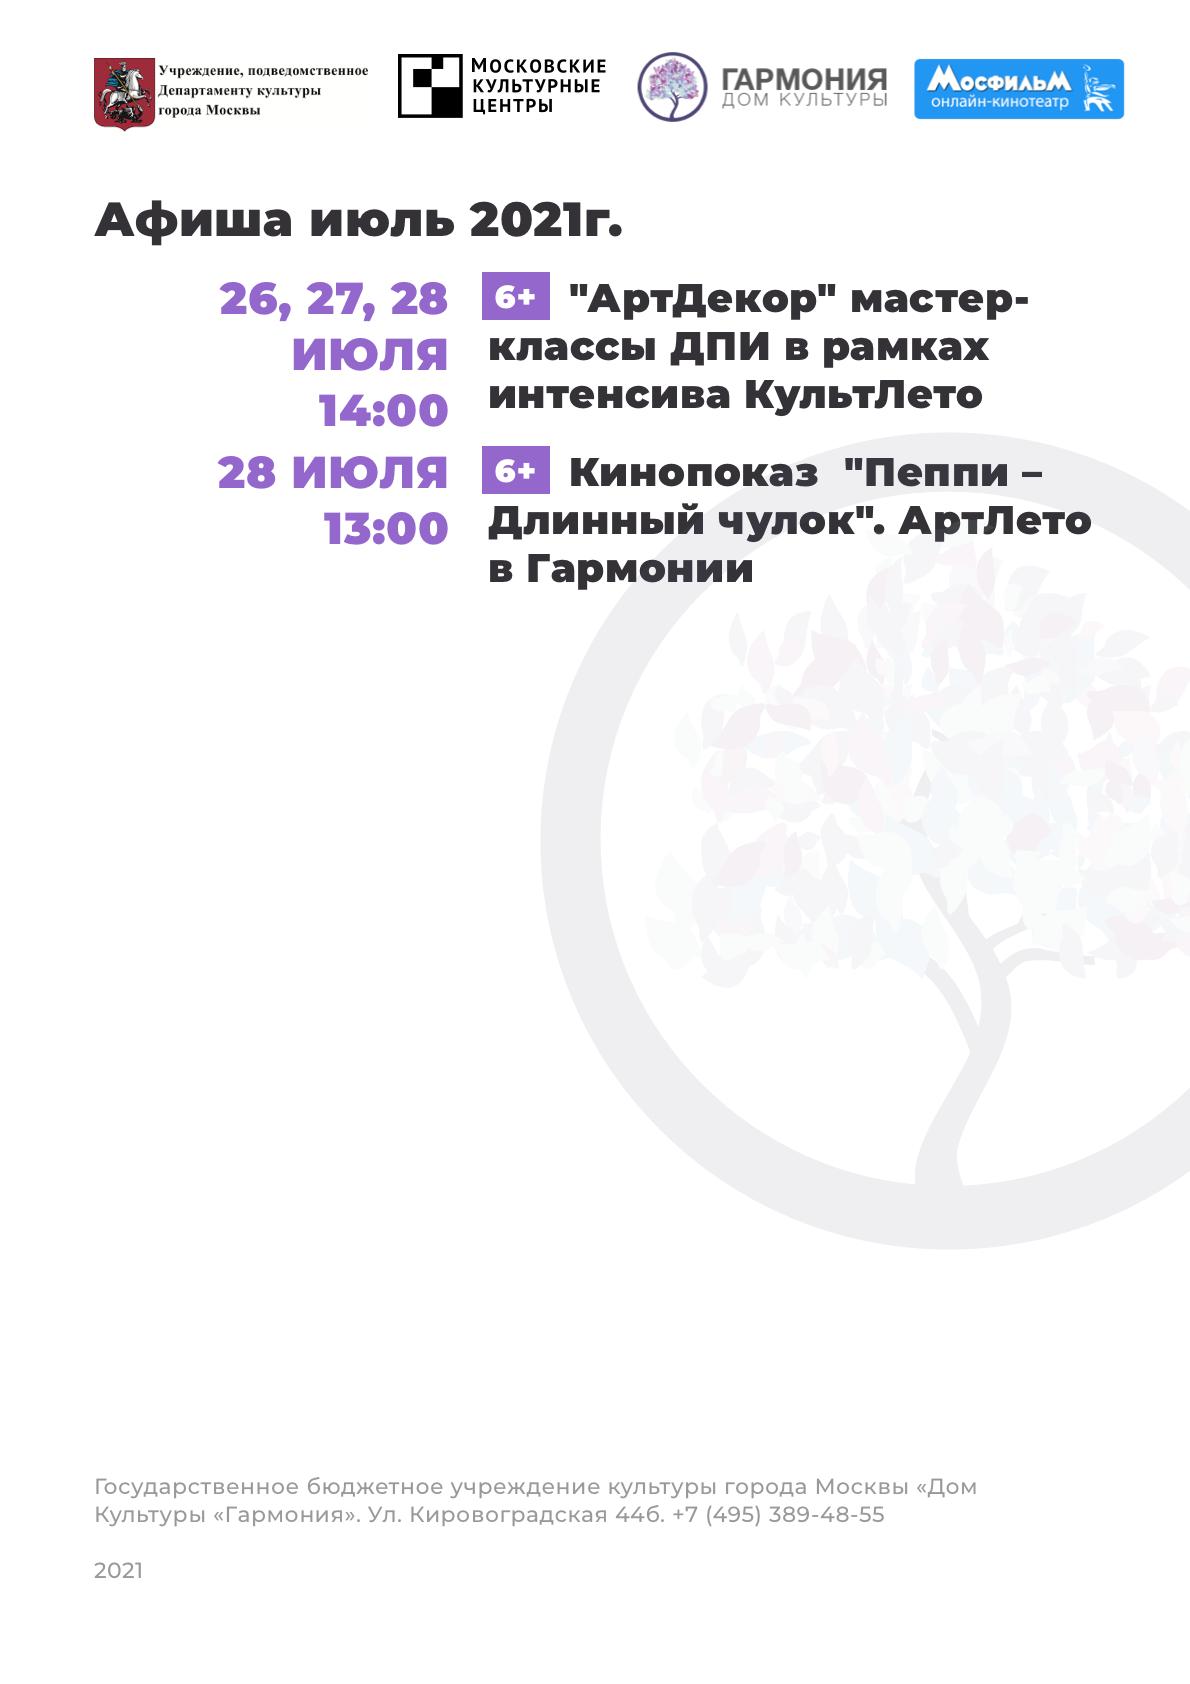 Афиша Июнь 2021 2 Copy 2@2x